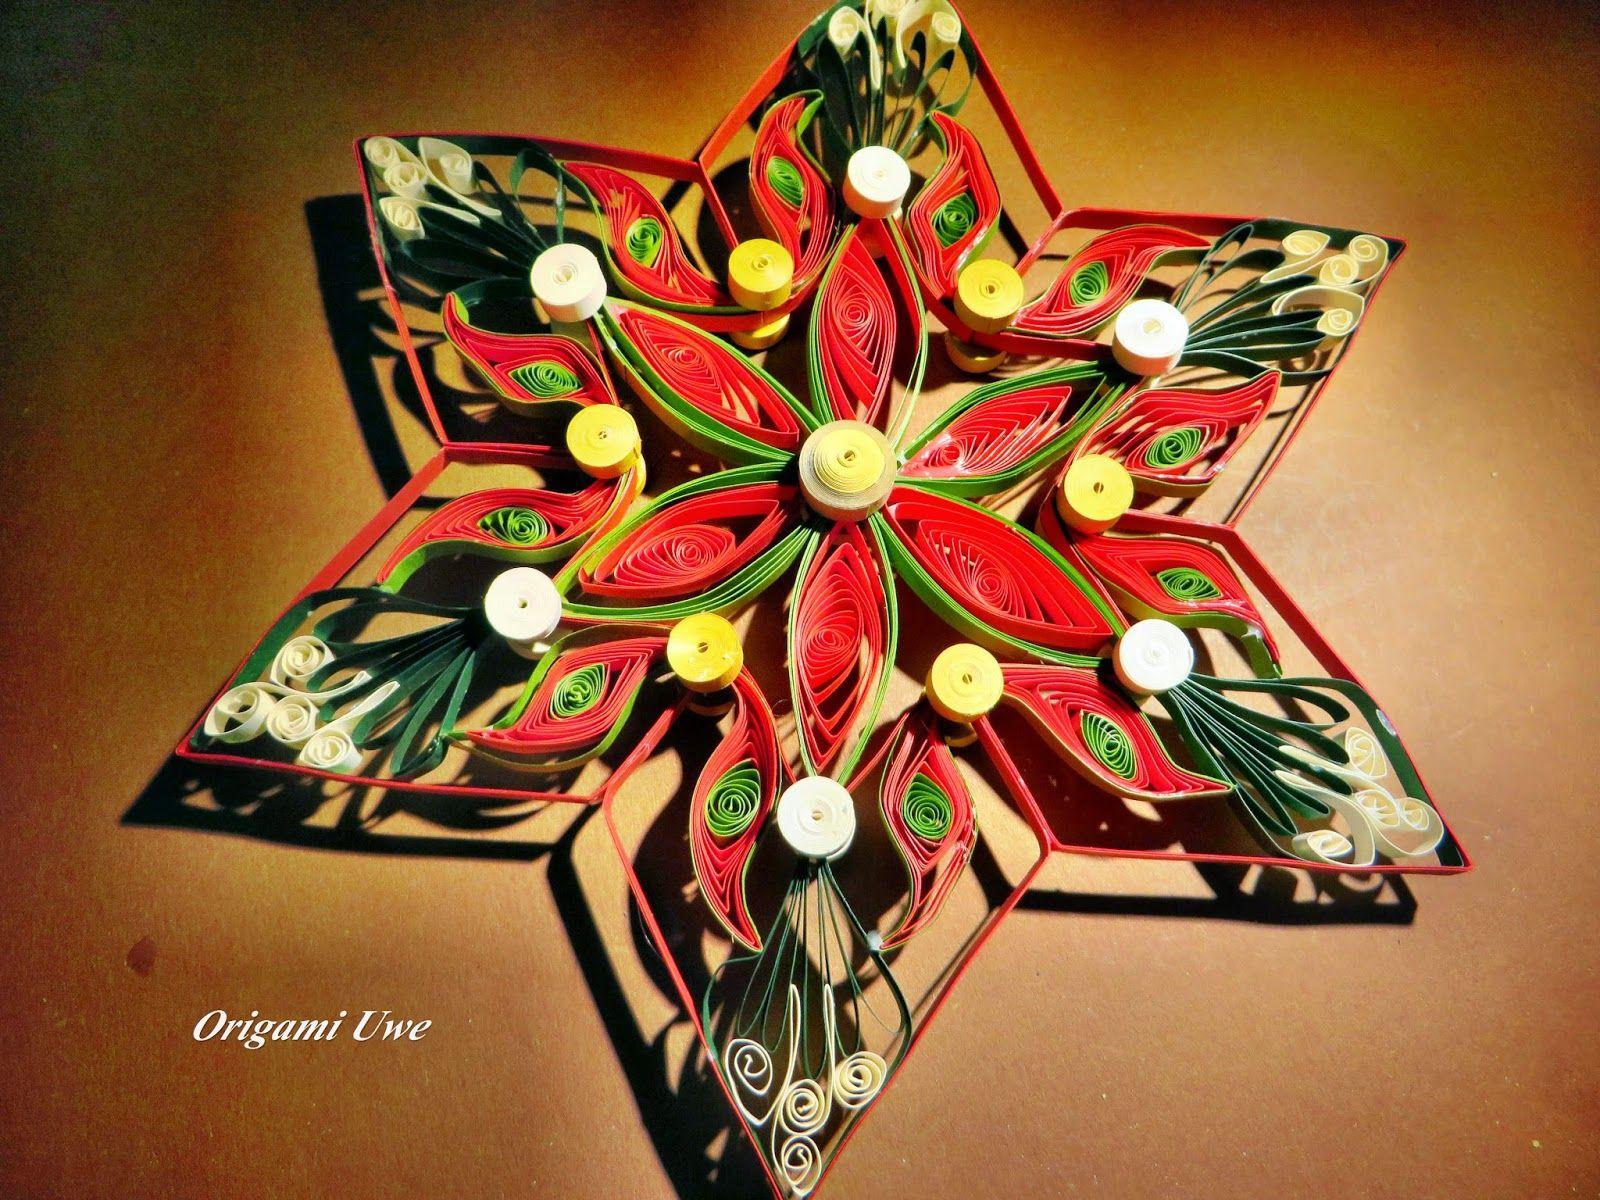 Origami, Quilling und Sterne: Quilling Star